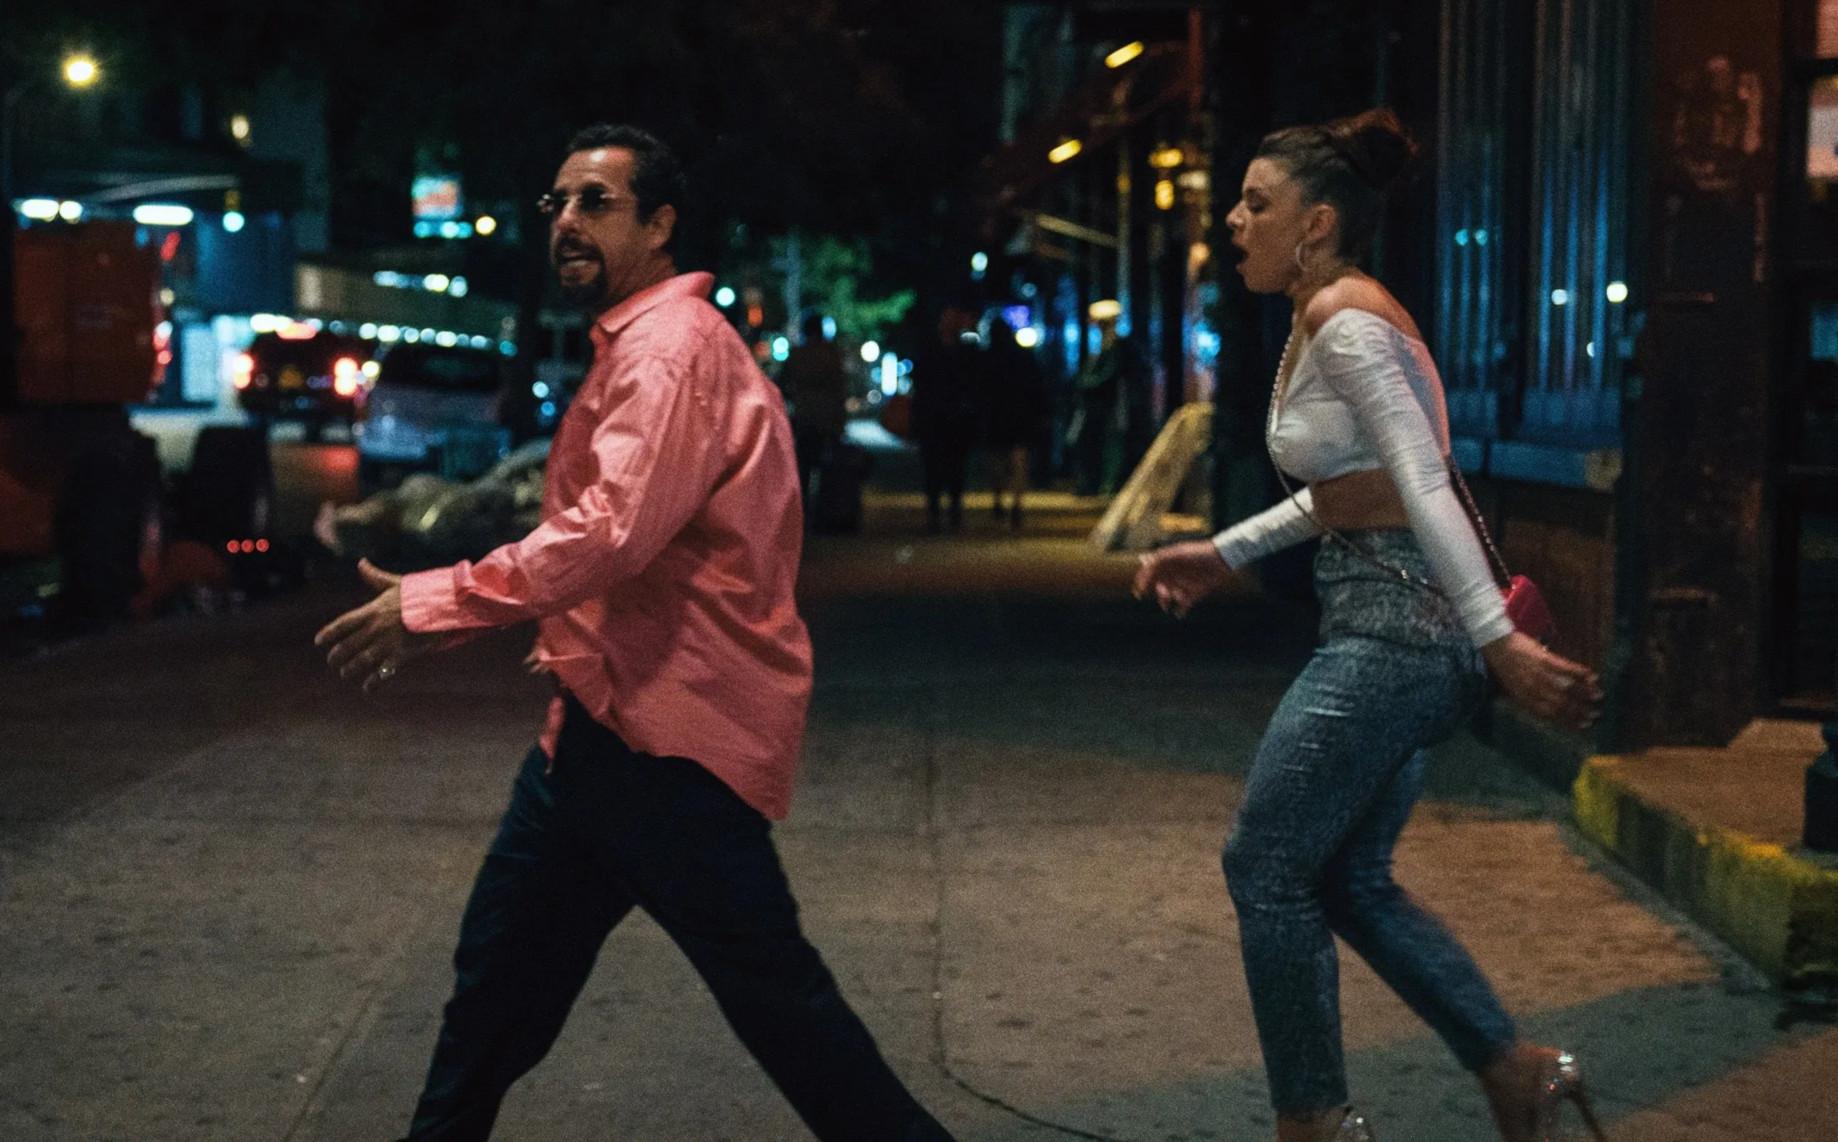 Uncut Gems: Μια από τις πιο ανατρεπτικές ταινίες, ίσως ο καλύτερος Άνταμ Σάντλερ που έχουμε δει